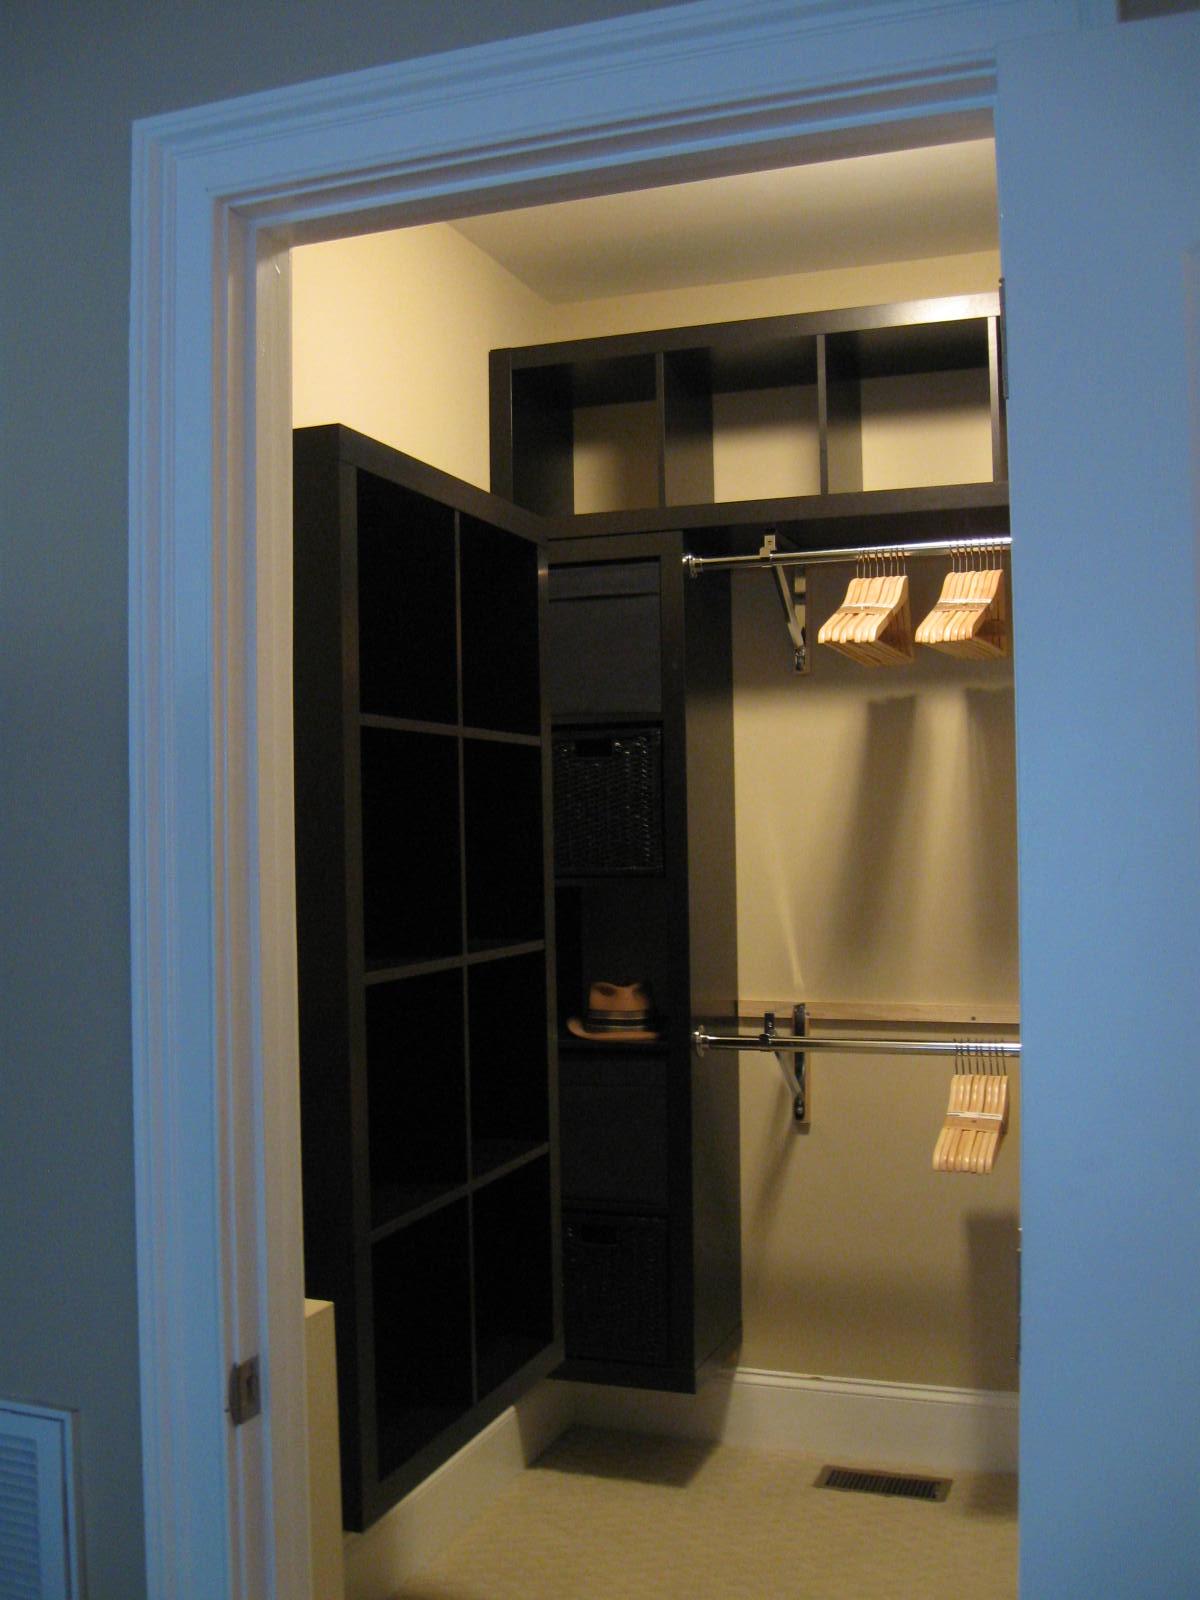 Materials: Expedit 1×5 (2), Expedit 2×4 (2), Lack Wall Shelf (43.25u2033), 1×2u2033  Cleats, Closet Rod / Shelf Brackets (4), Closet Rods (2), Closet Rod Flange  Set ...